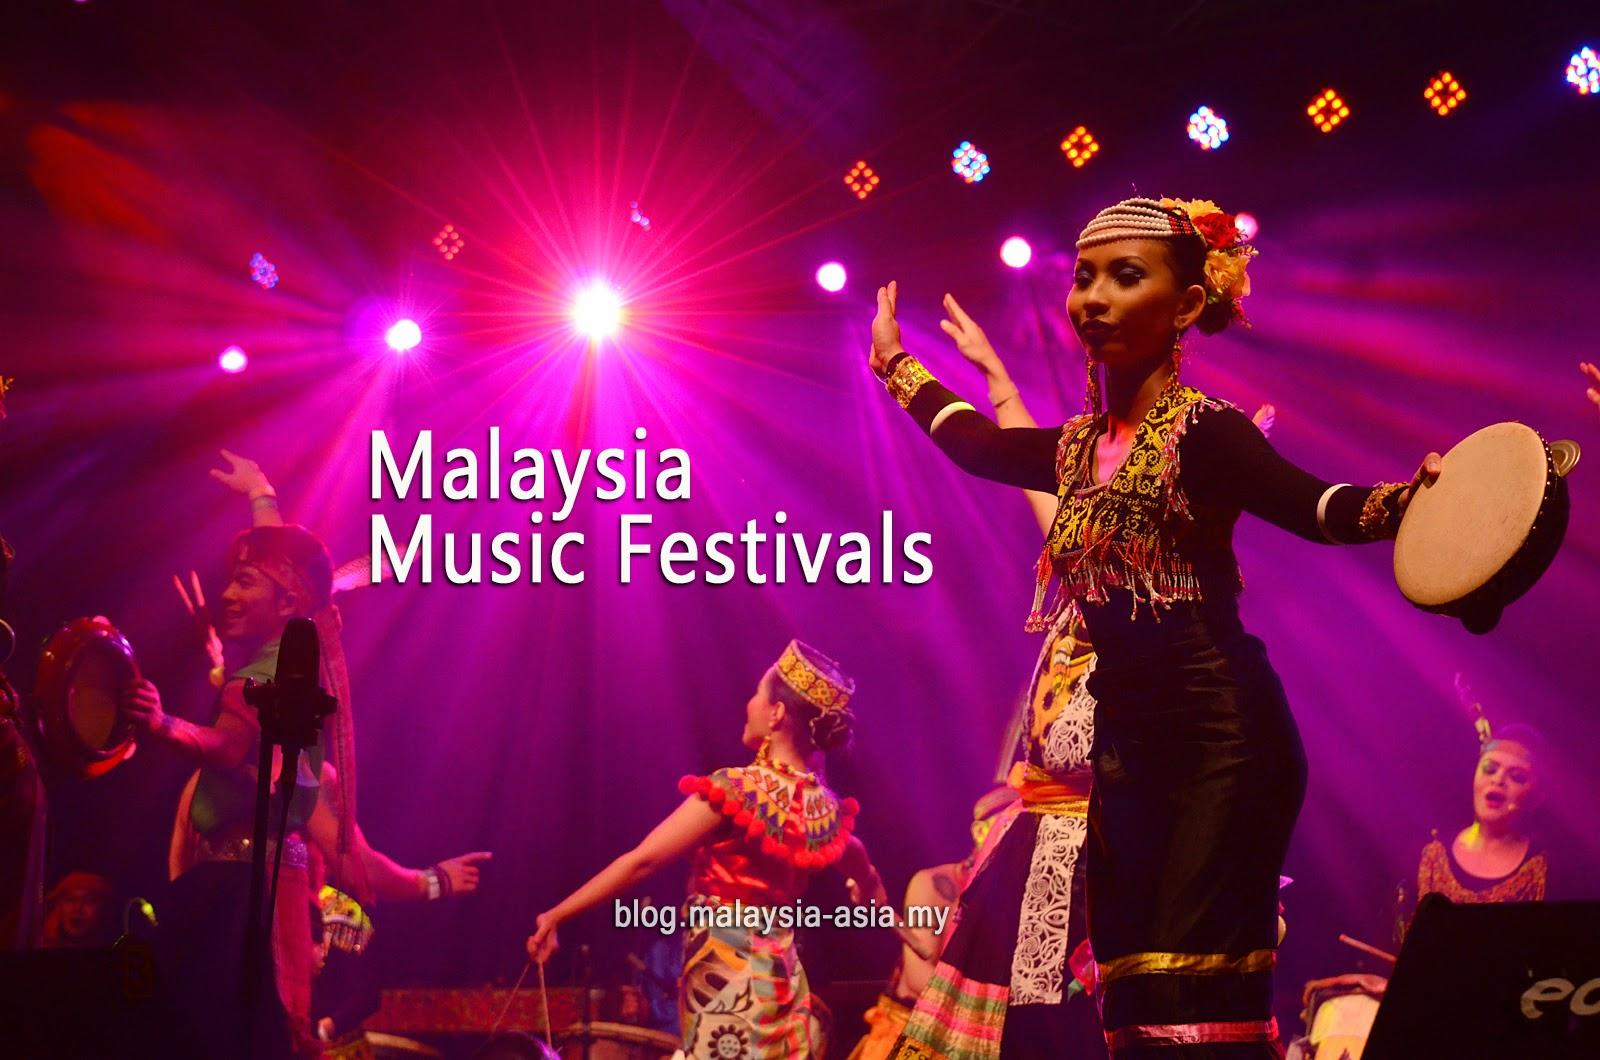 Malaysia Music Festivals 2015